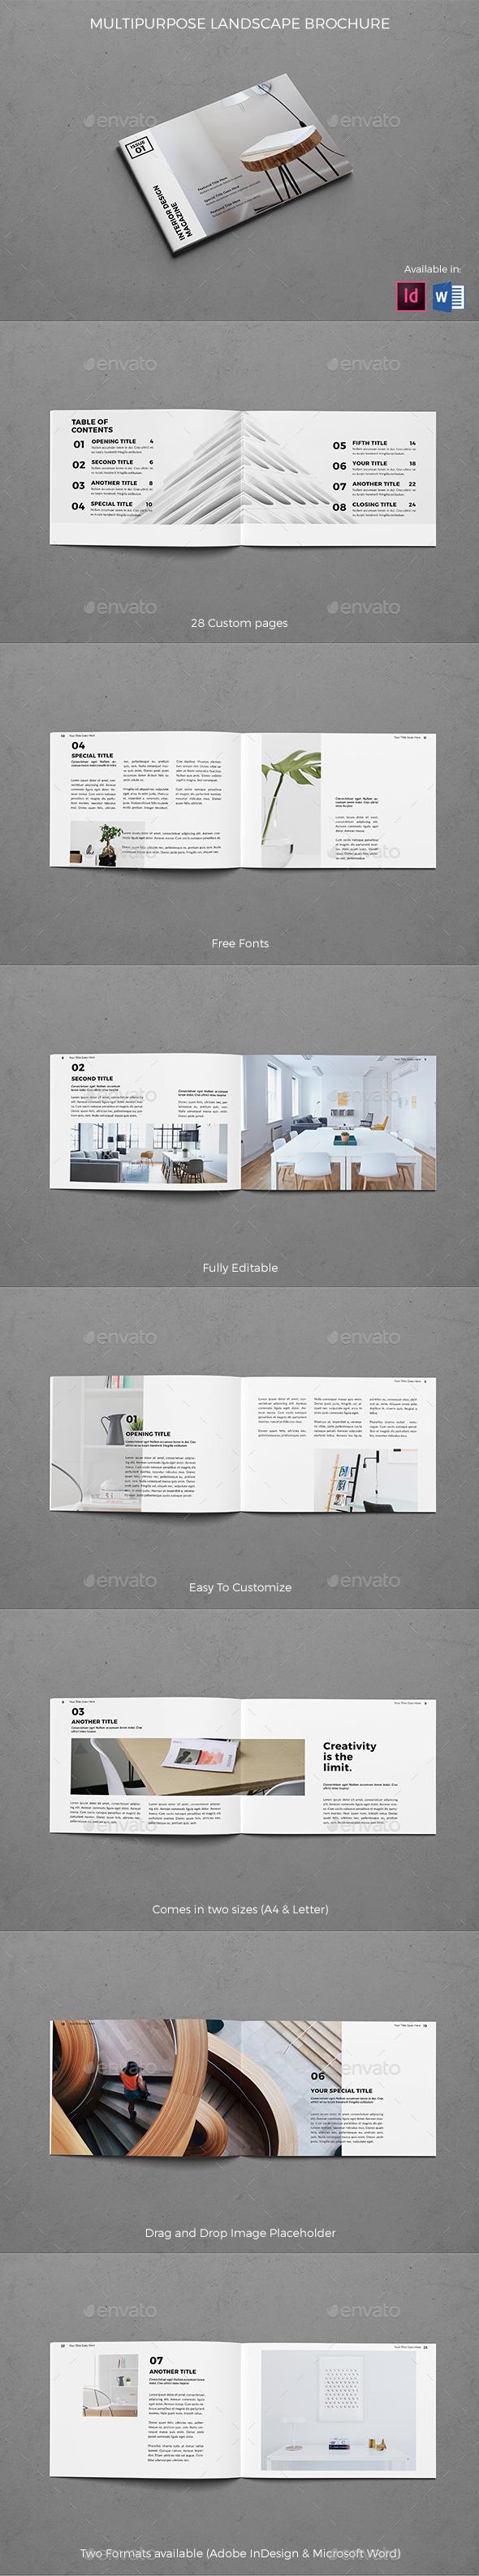 Modern Architecture Landscape Brochure - Brochures Print Templates